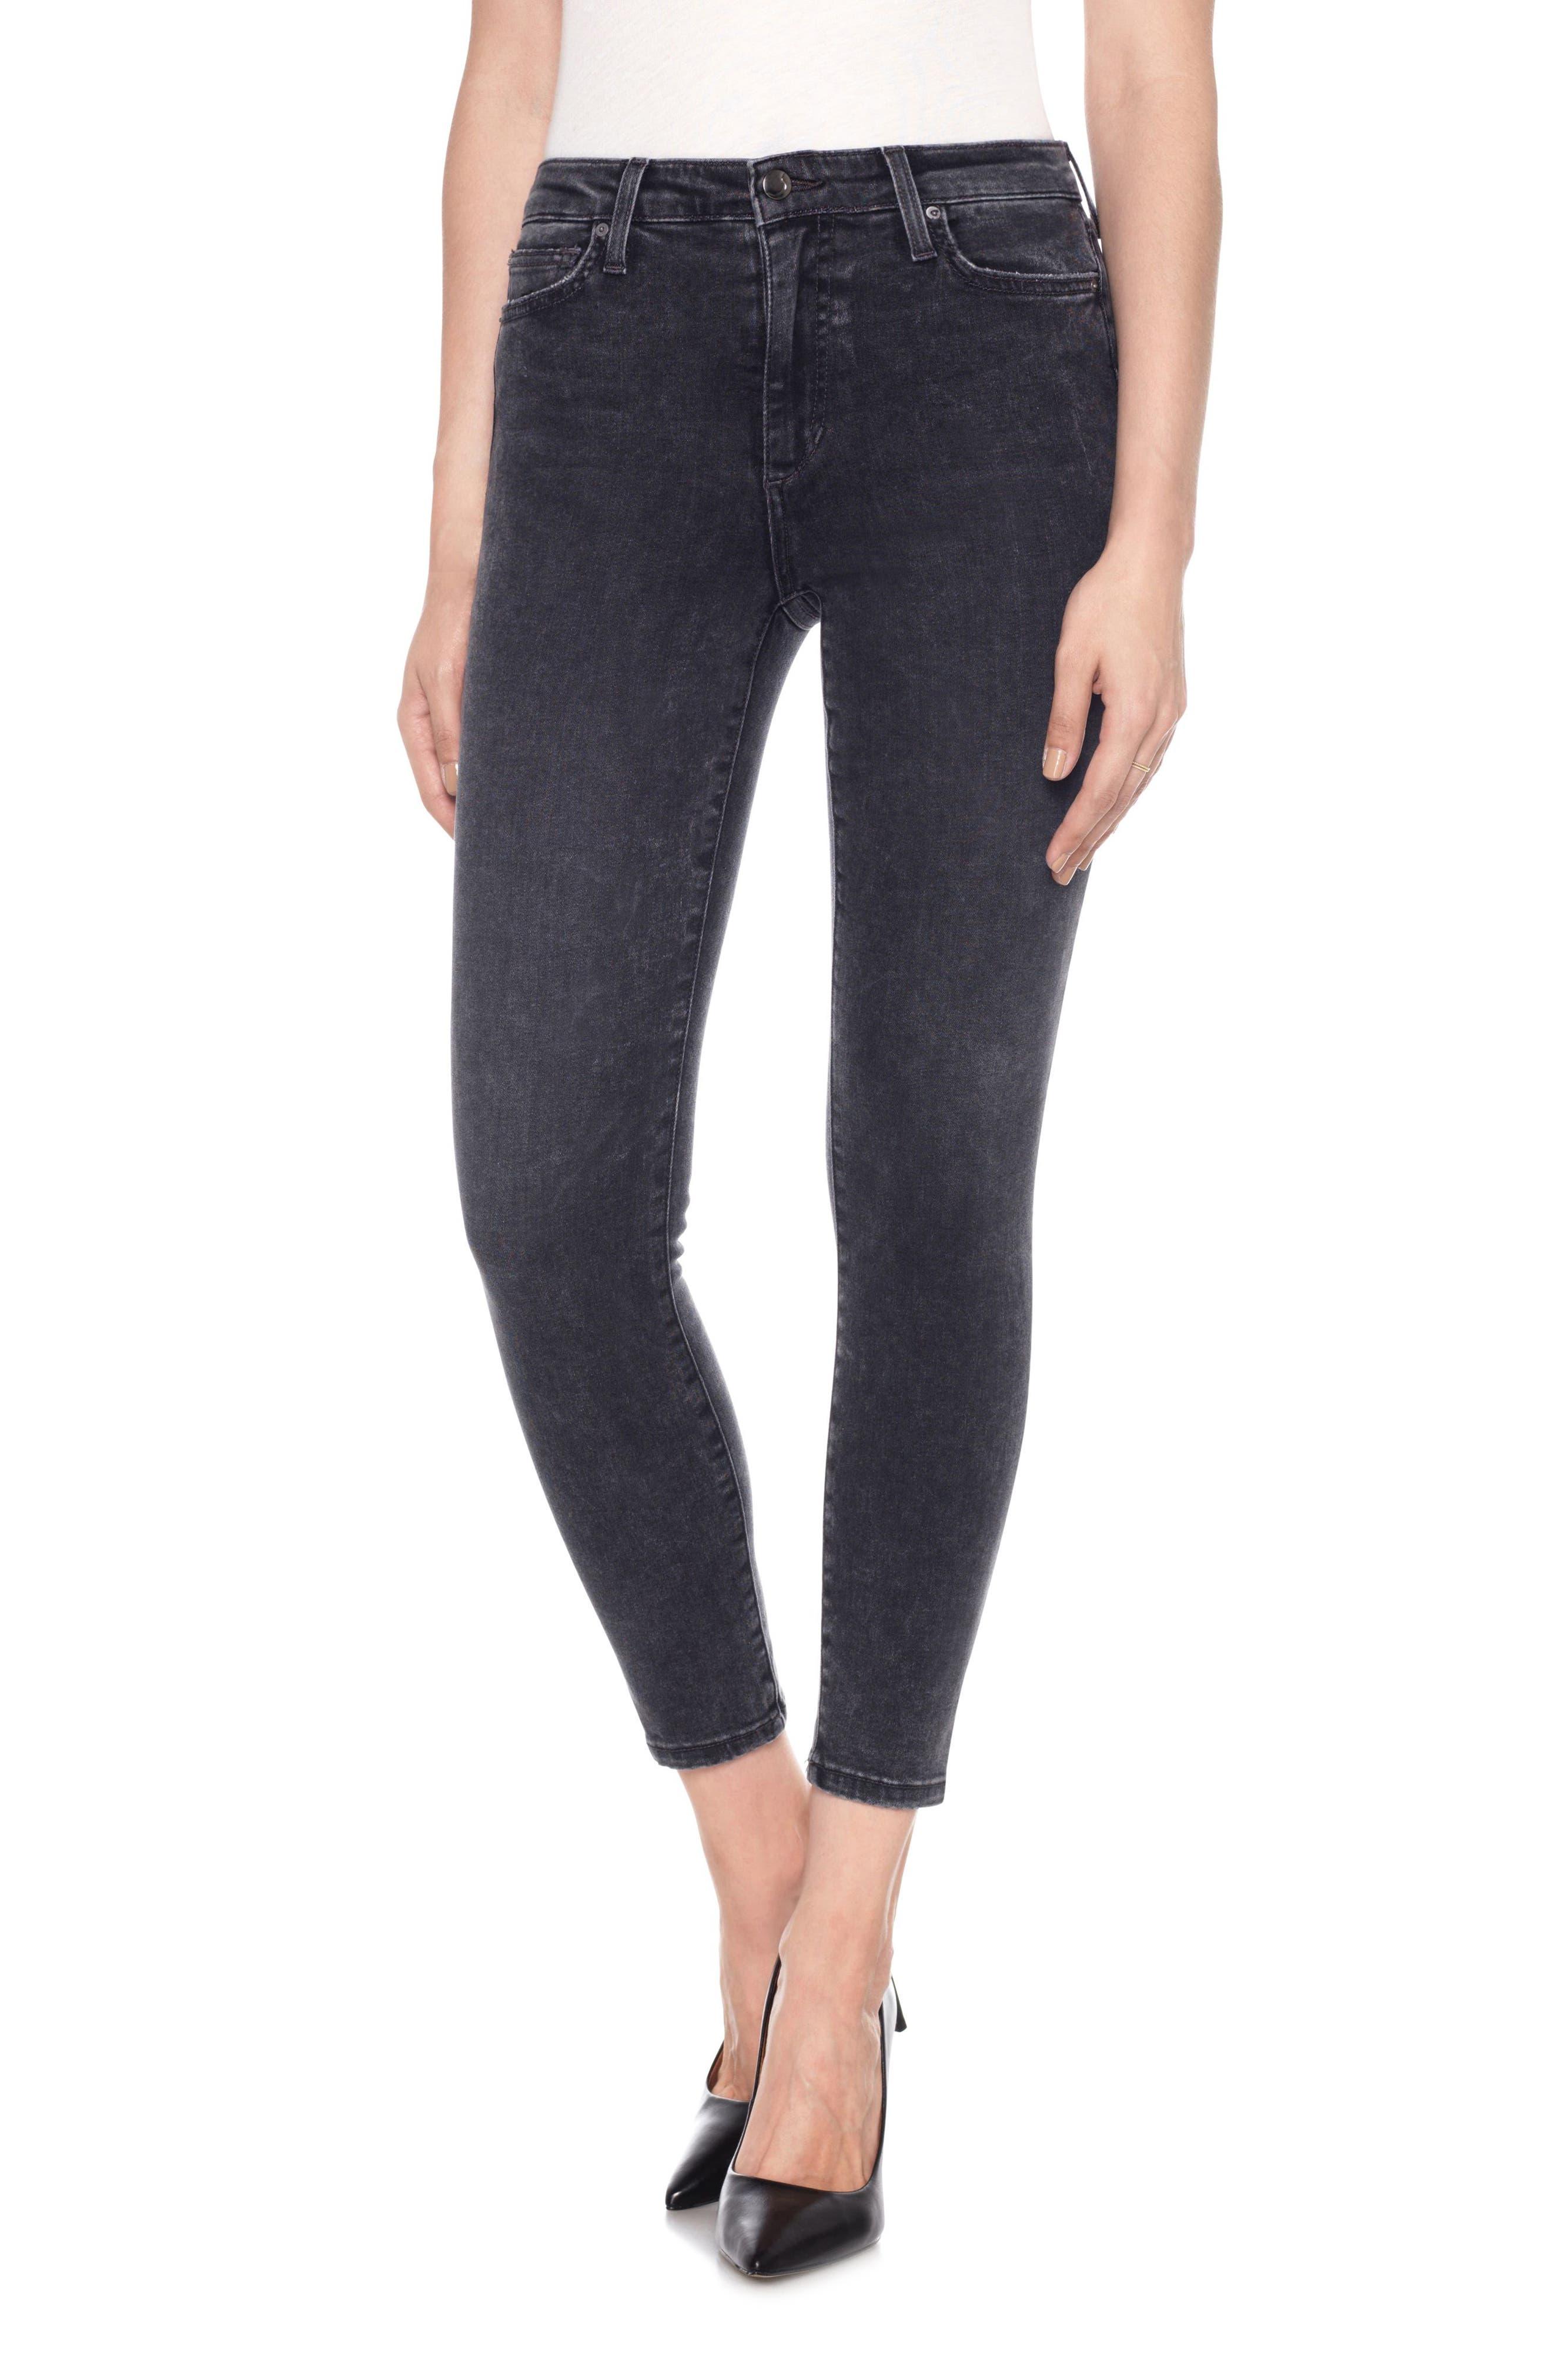 Main Image - Joe's Charlie High Waist Ankle Skinny Jeans (Clare)